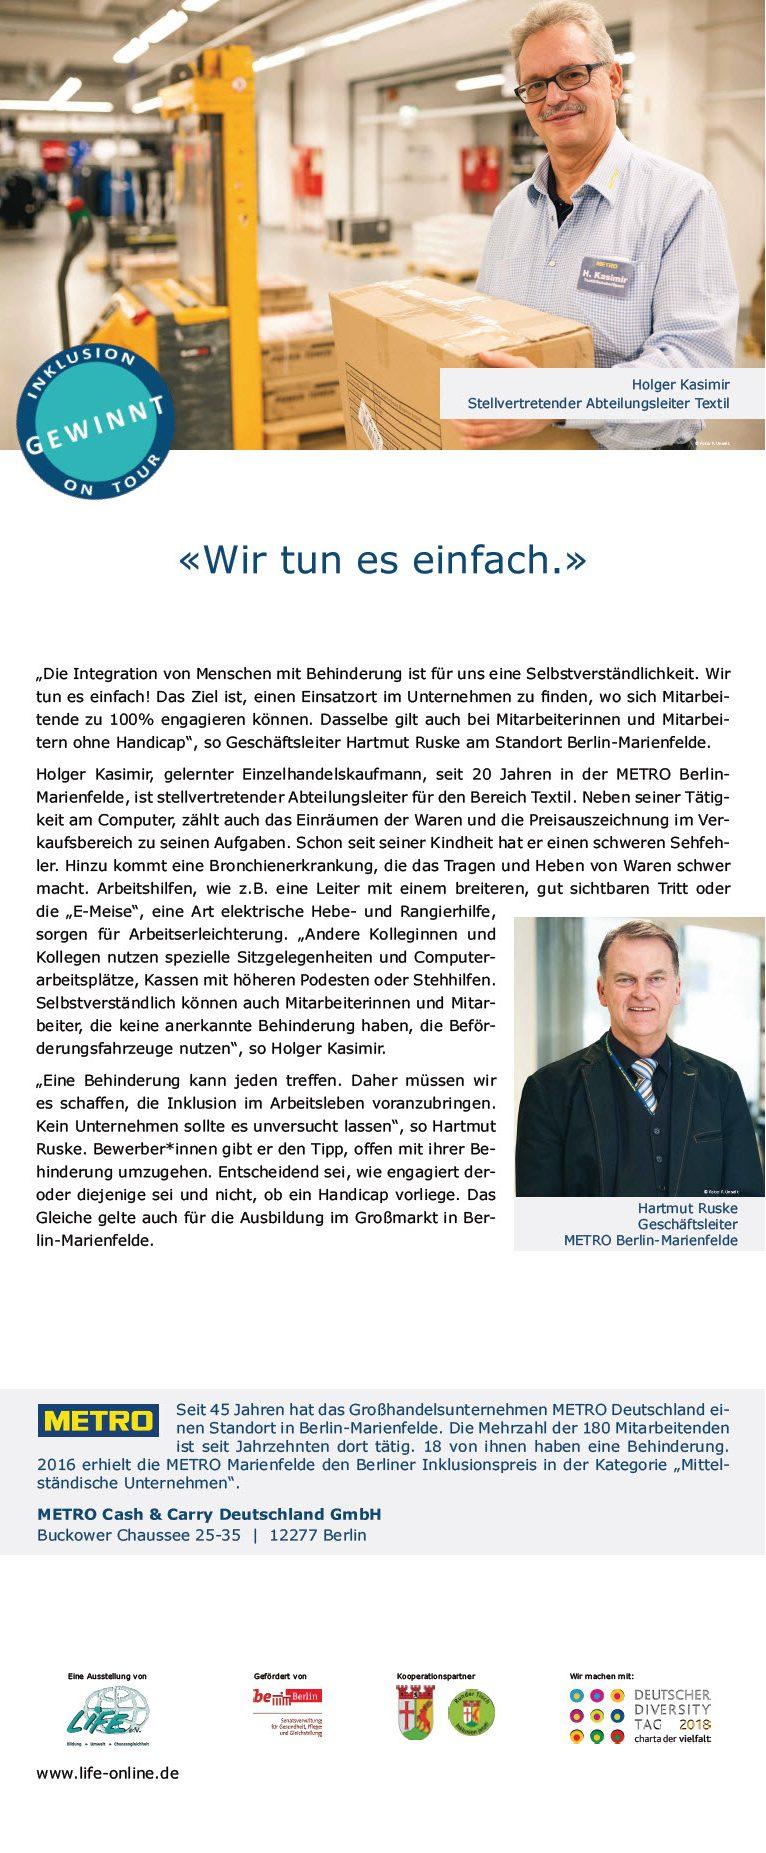 "Roll-Up METRO Berlin Marienfelde, Wanderausstellung ""Inklusion gewinnt! On Tour"""